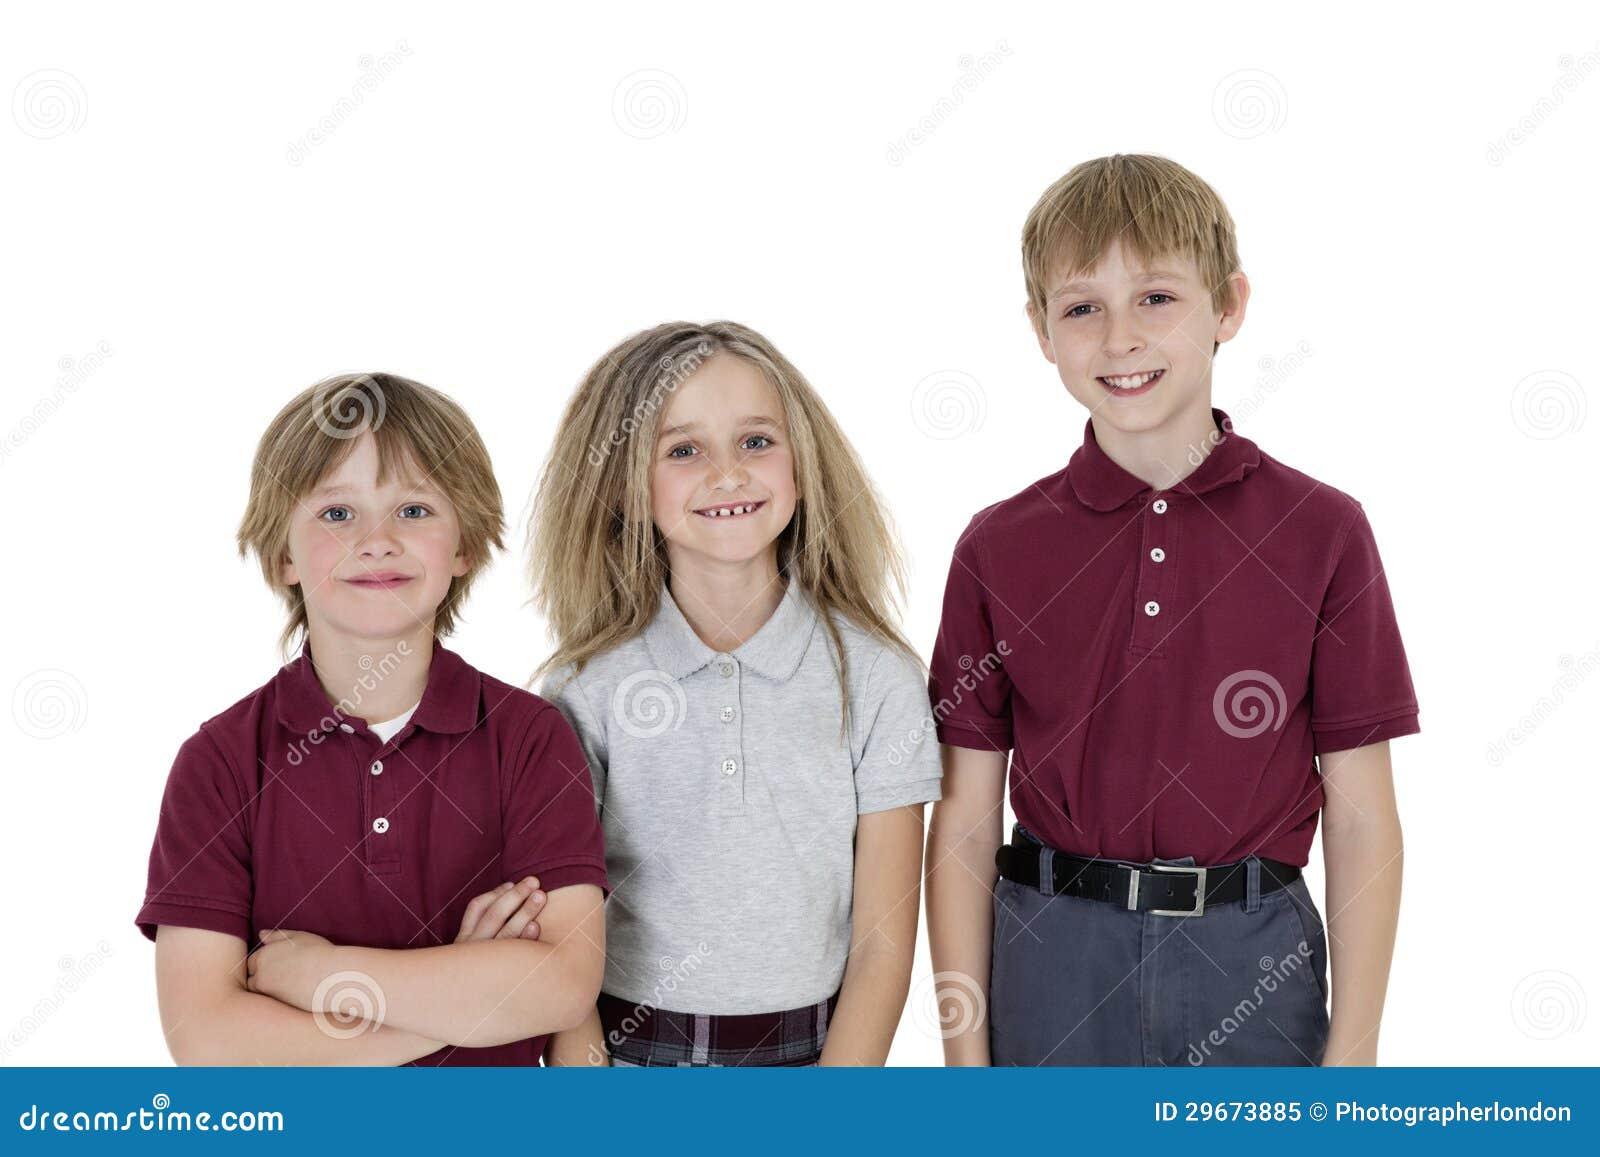 Portrait Of Happy School Children In Uniform Over White ...